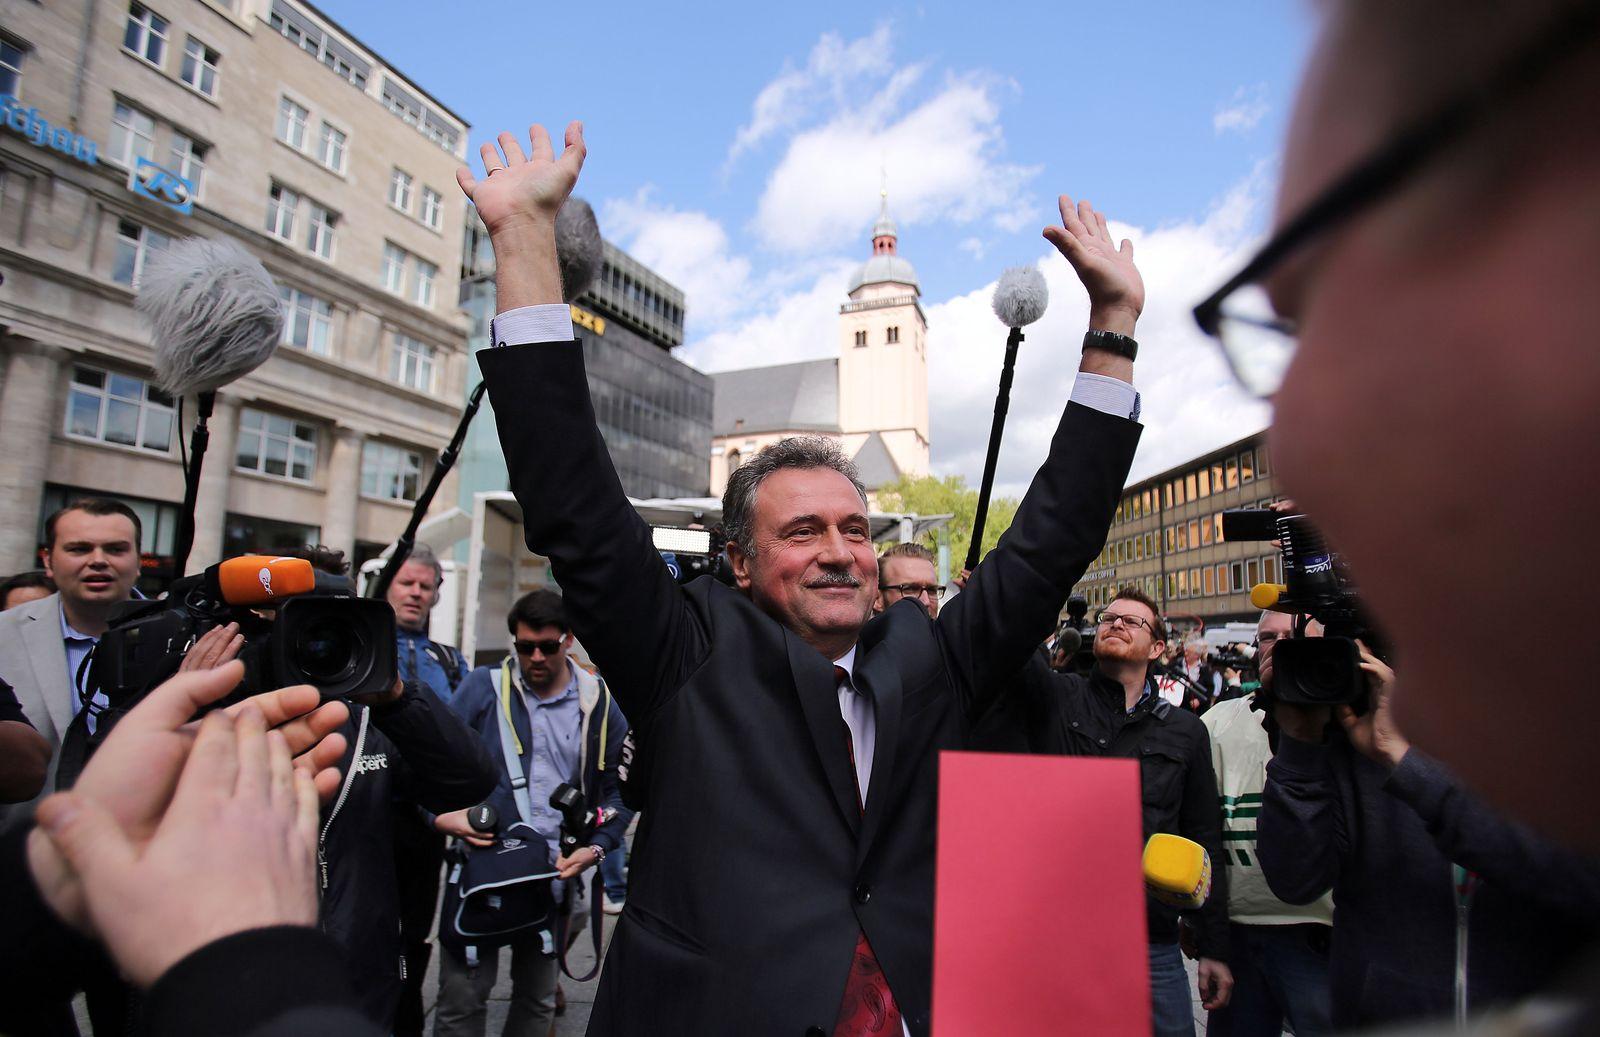 VIDEOTEASER_Streikkundgebung GDL - Claus Weselsky